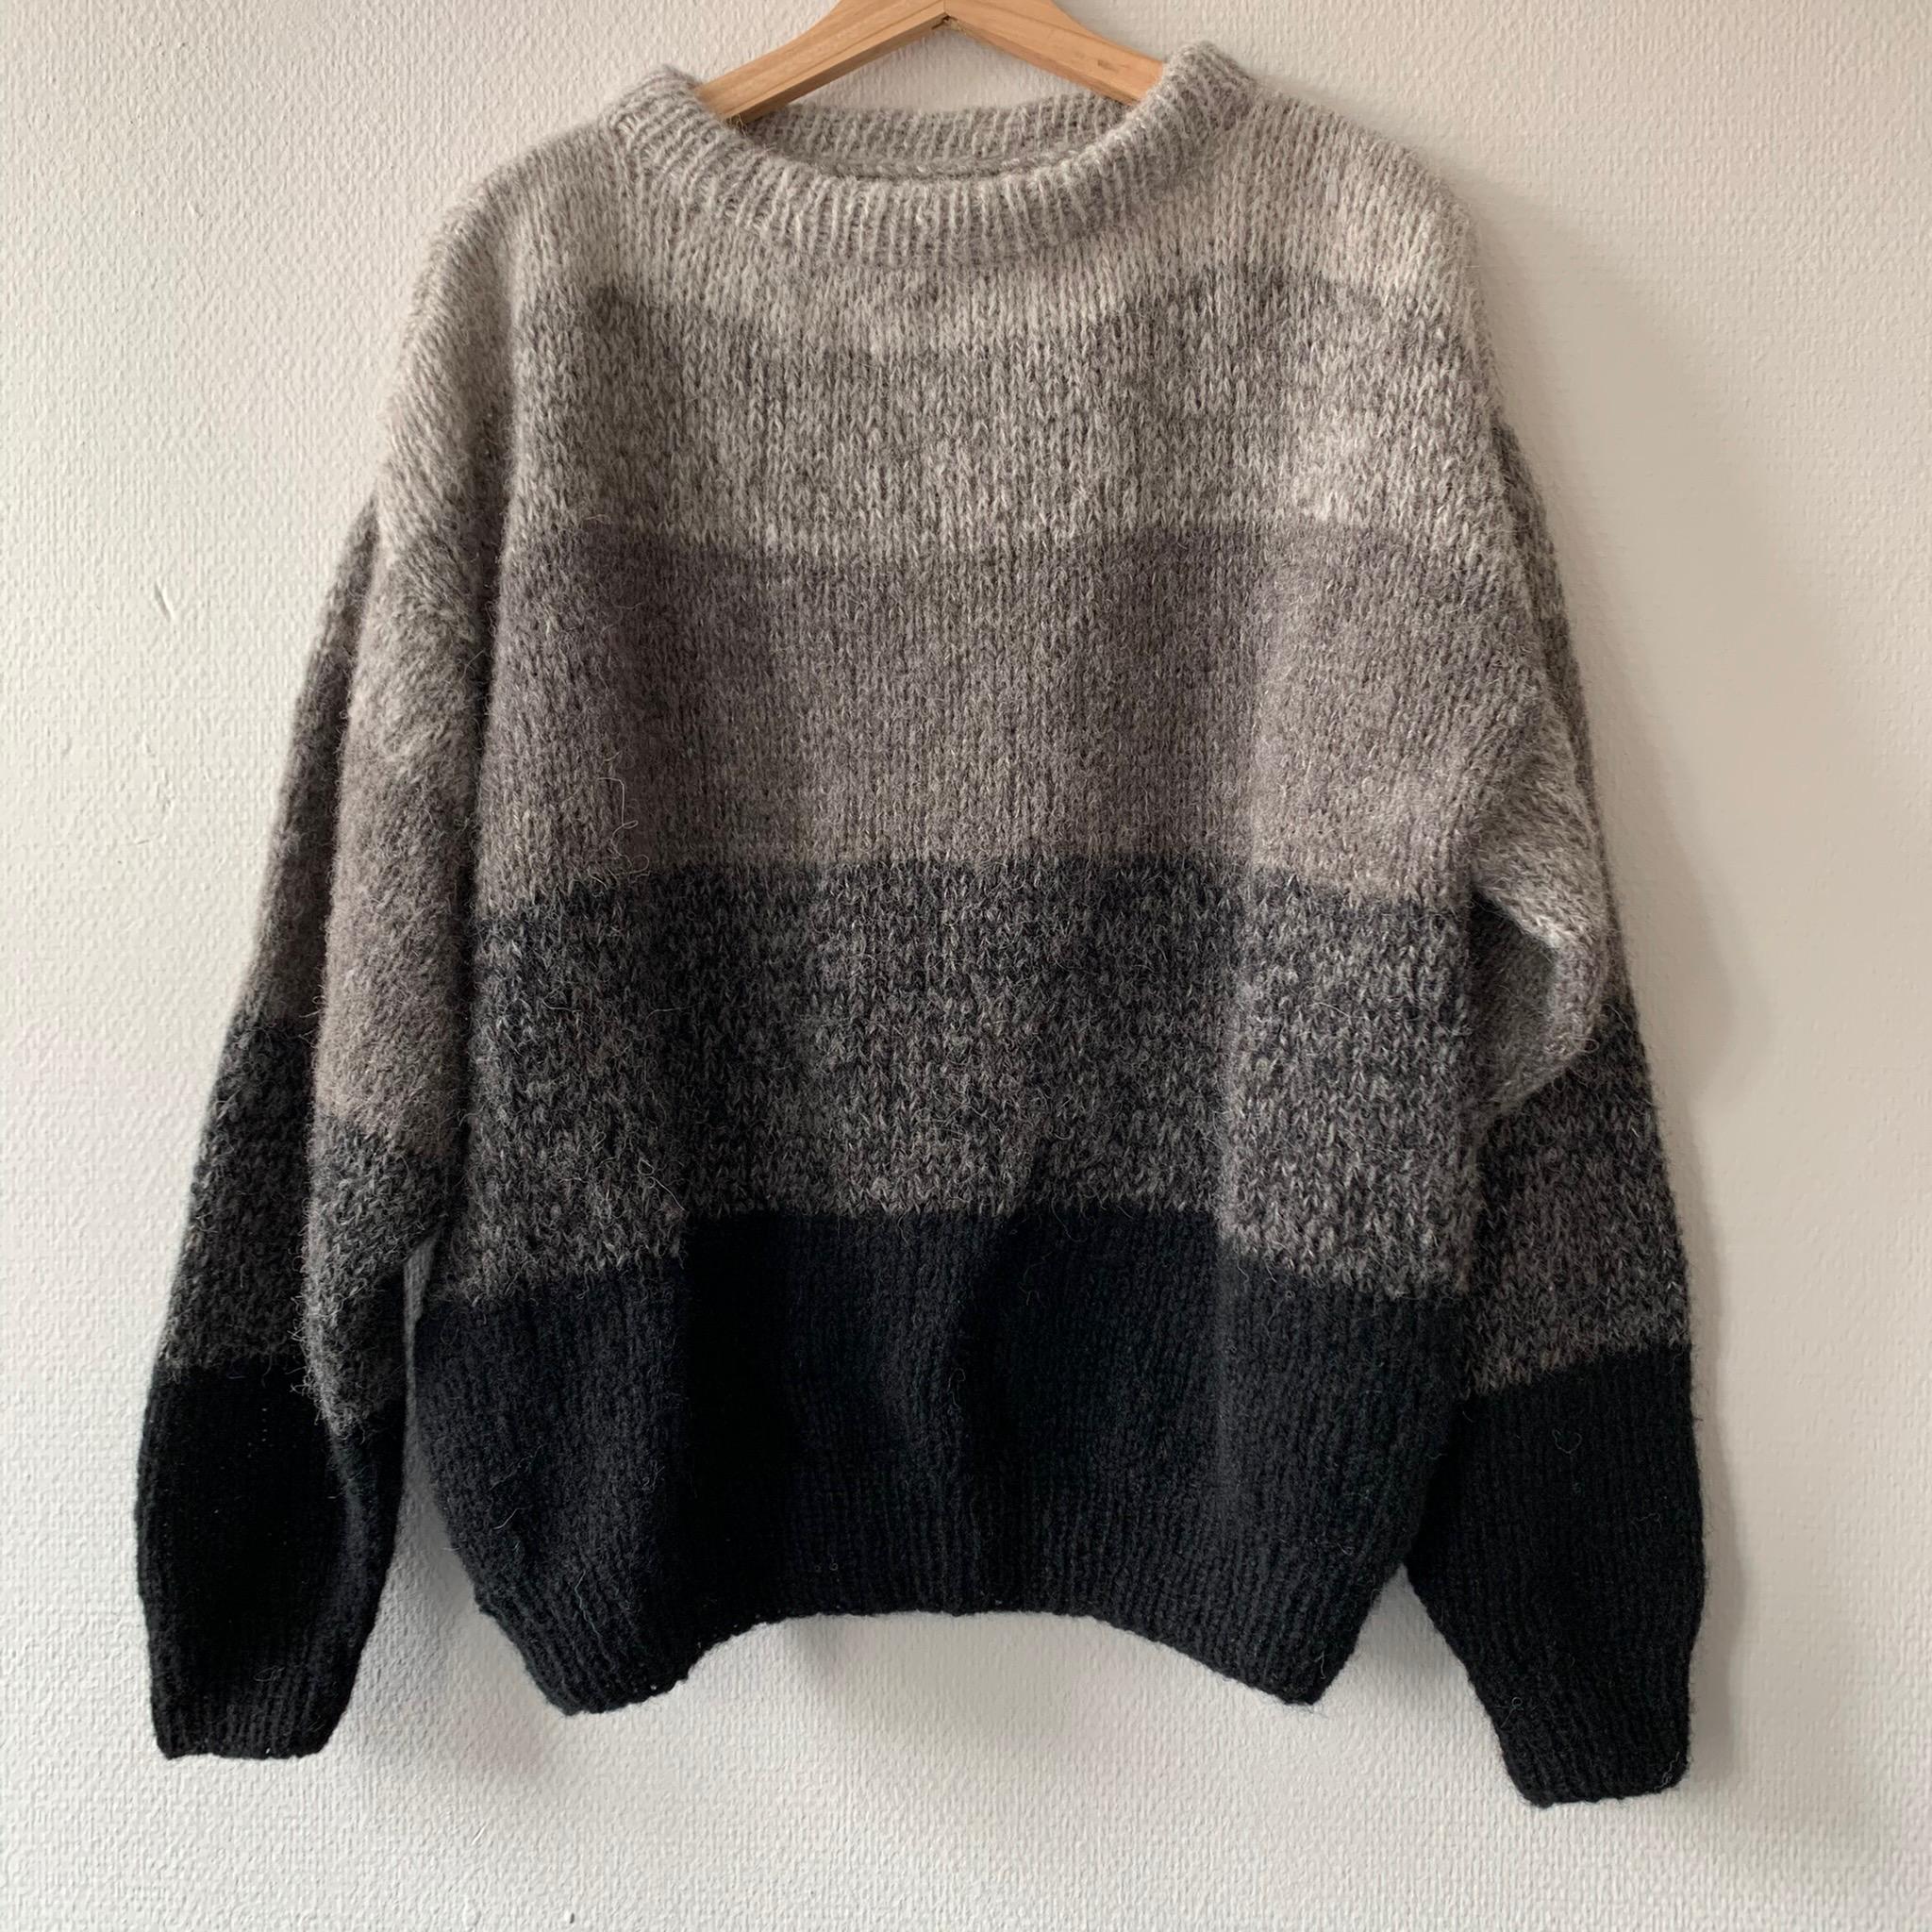 Stripes grå/sort